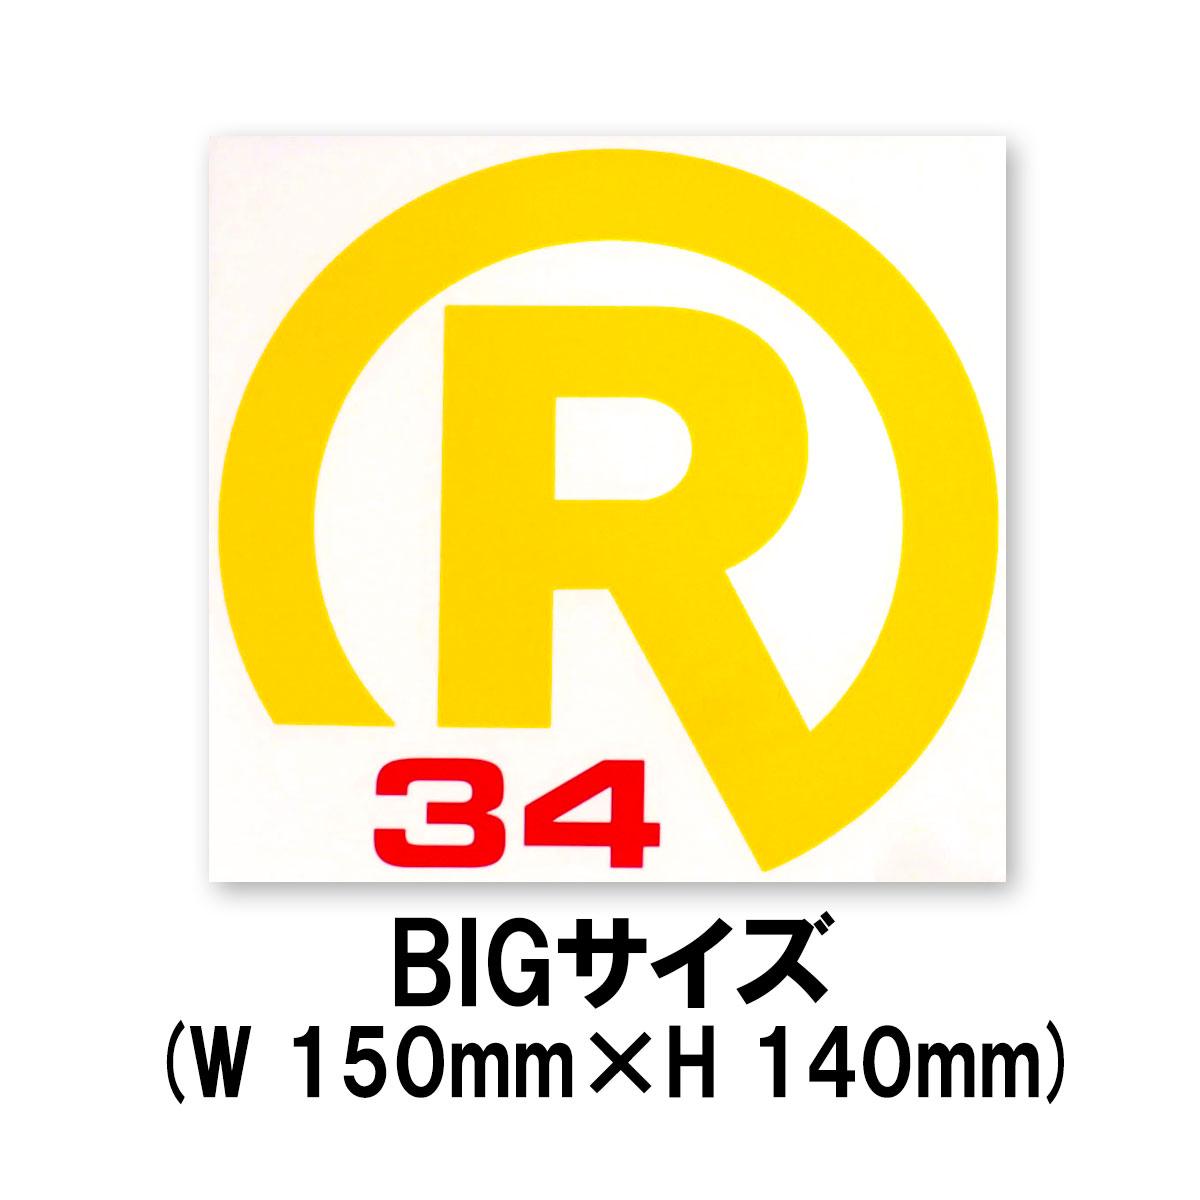 STICKER R34 YELLOW BIGサイズ